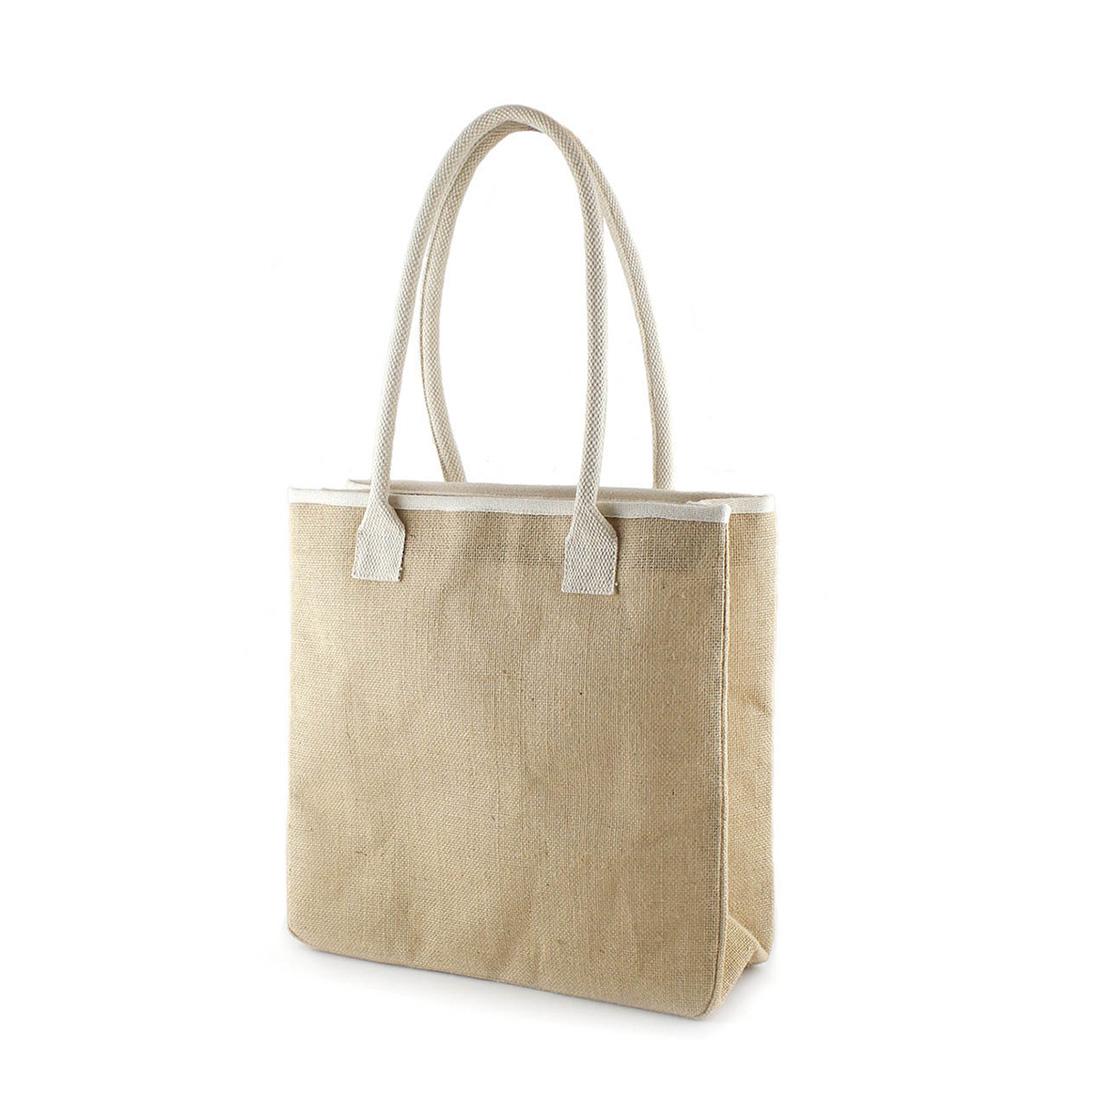 sac cabas azur en toile de jute personnaliser. Black Bedroom Furniture Sets. Home Design Ideas